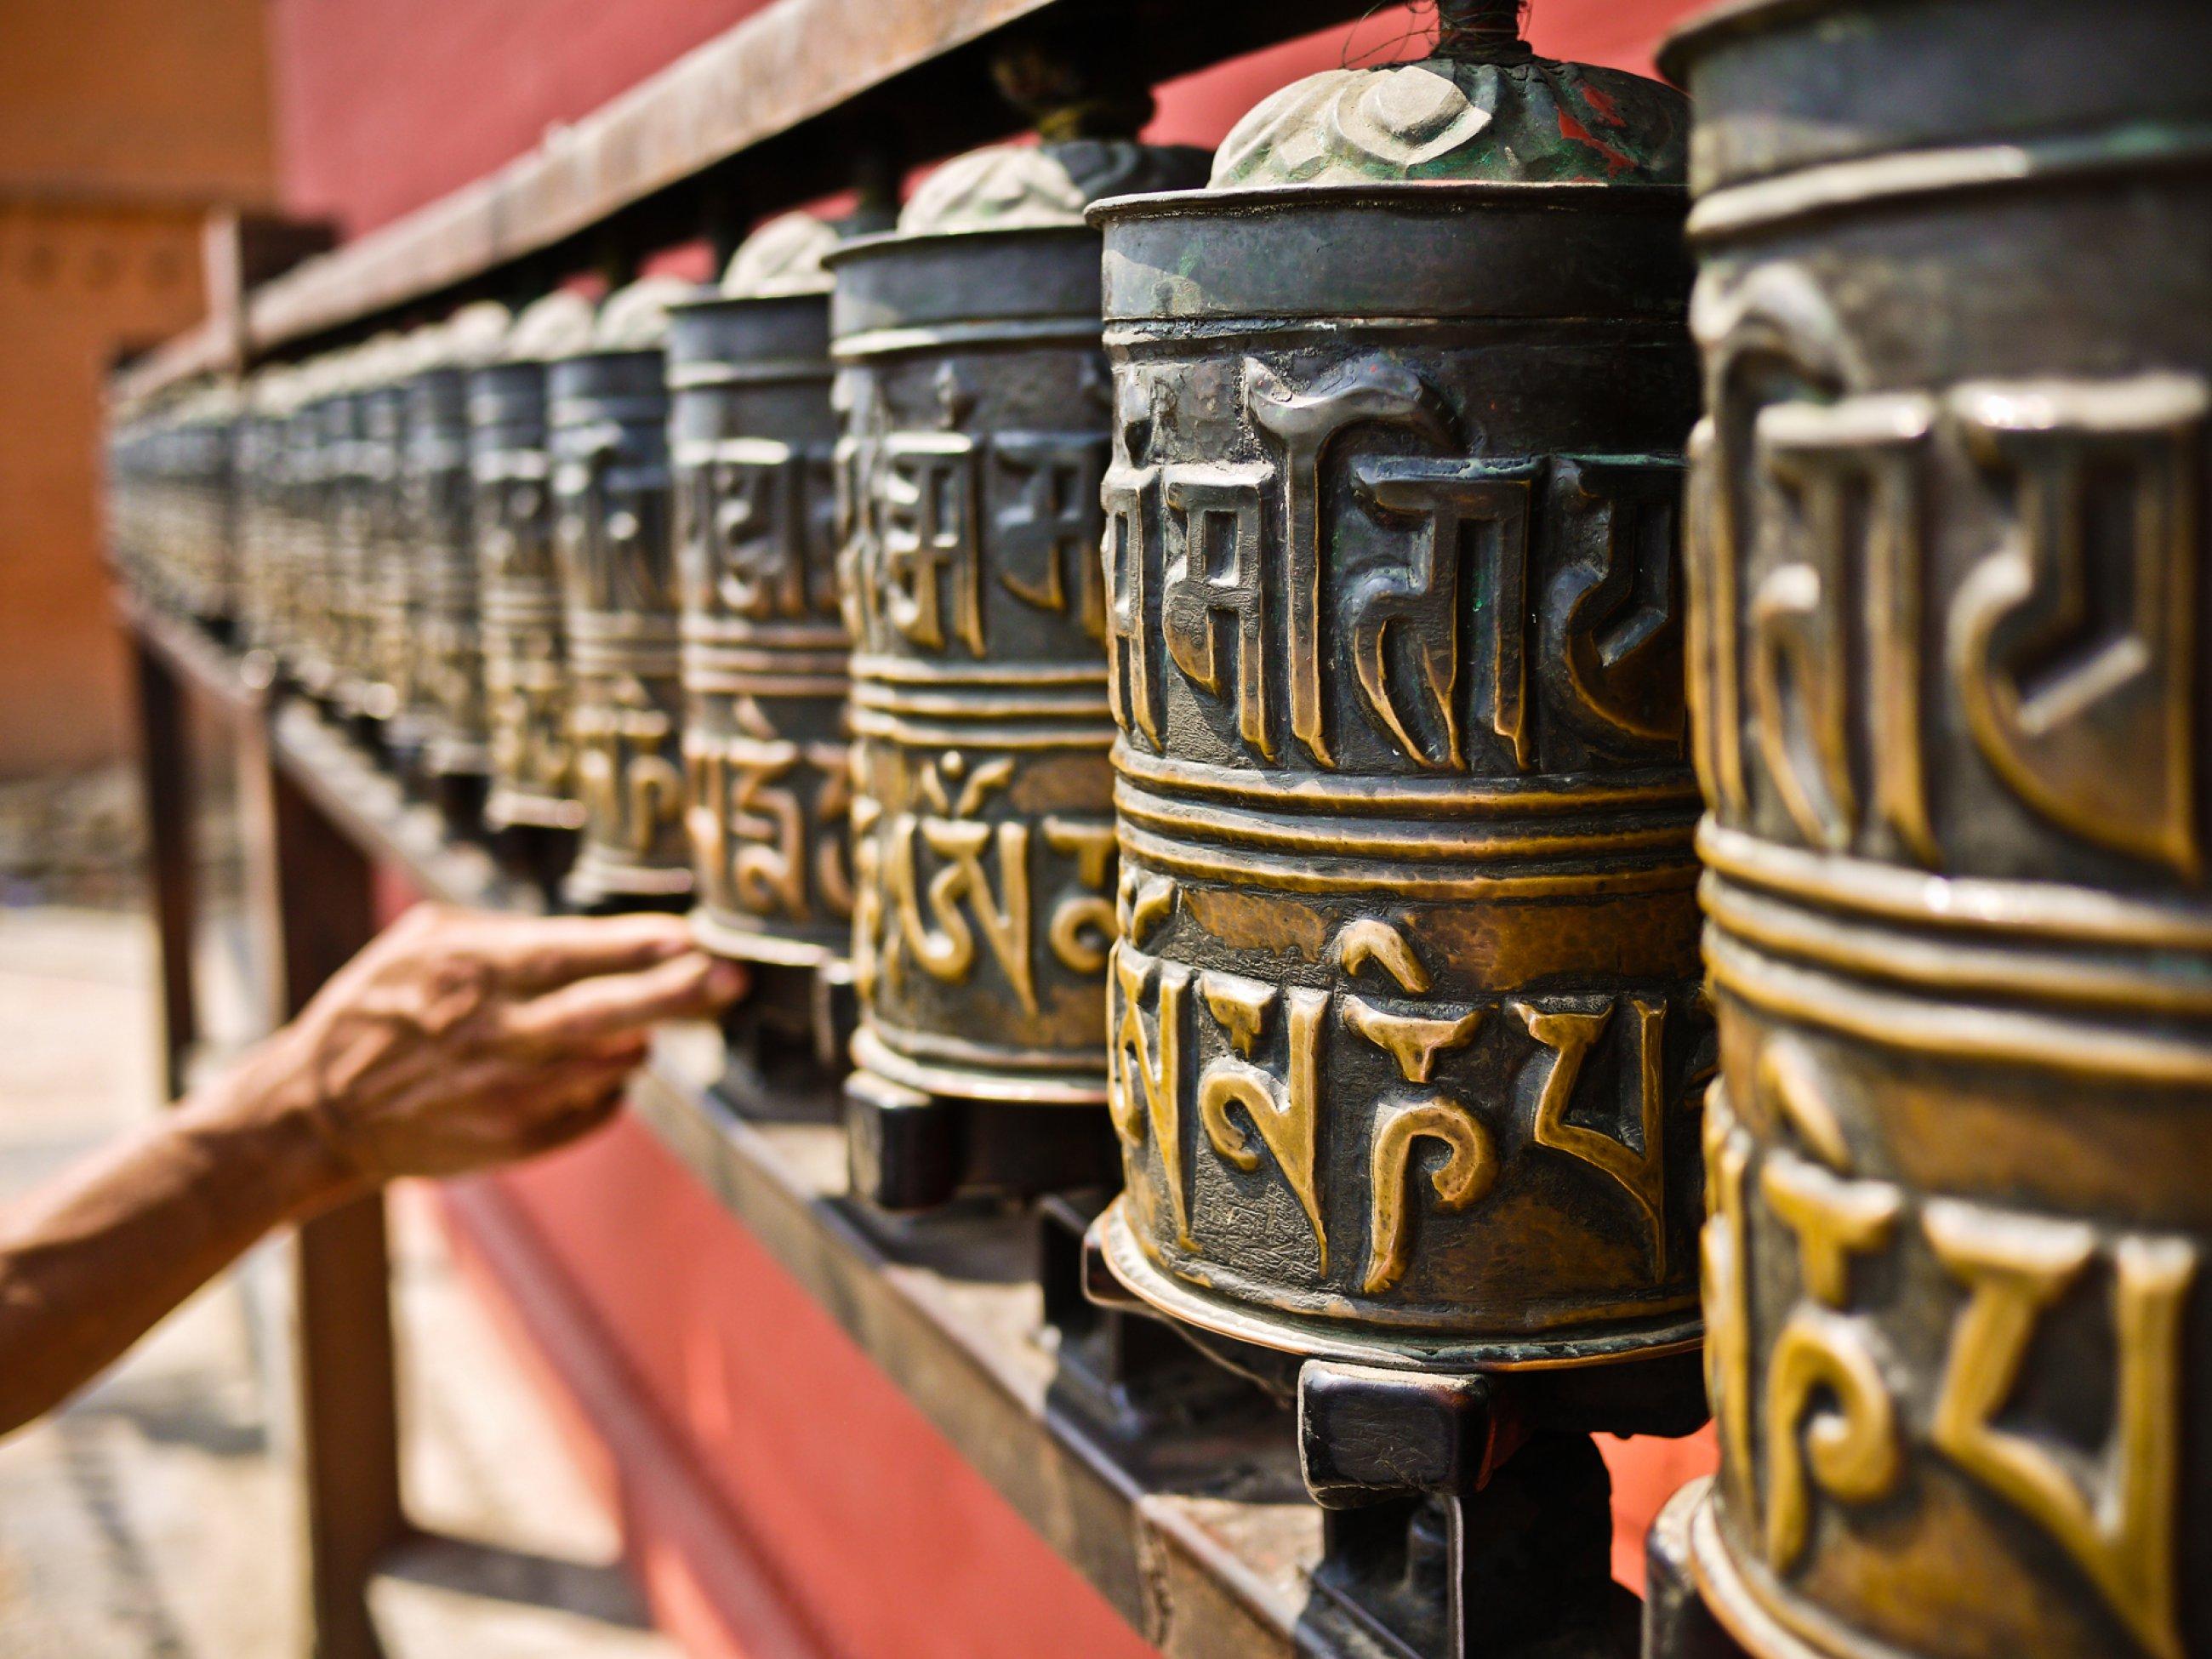 https://bubo.sk/uploads/galleries/16269/tibet-shutterstock-127081172.jpg